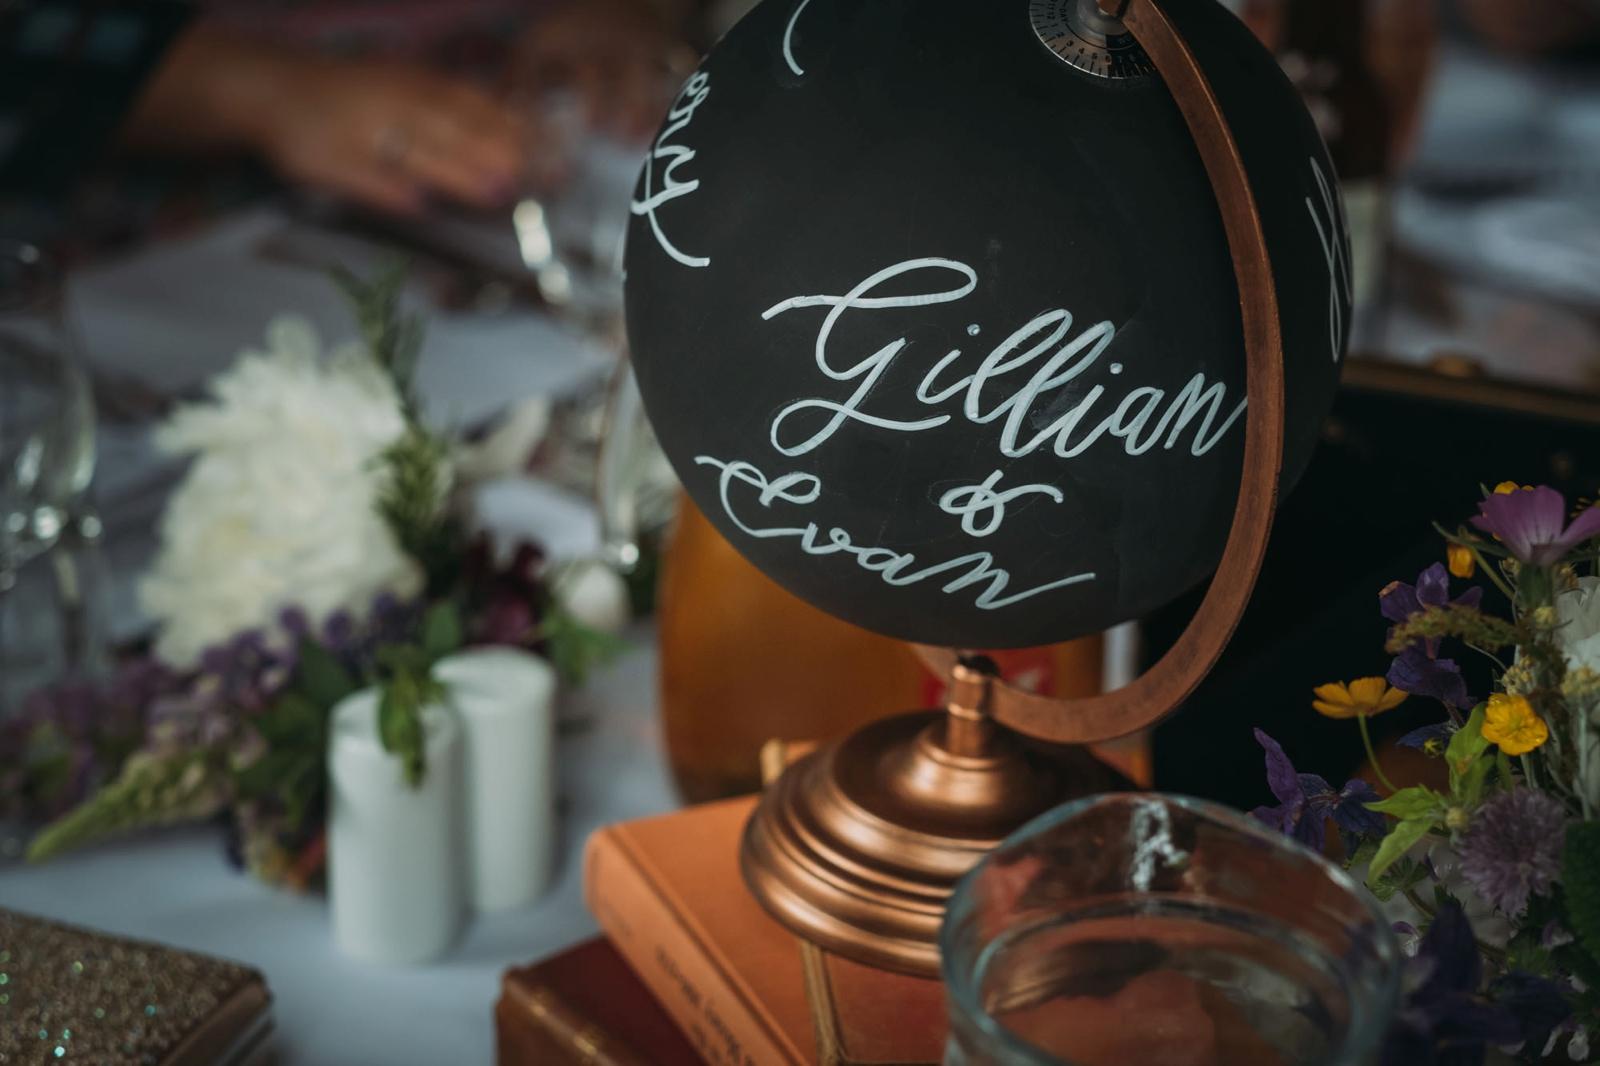 Gillian-Evan-West-Brewery-Jo-Donaldson-Photography-432.jpg